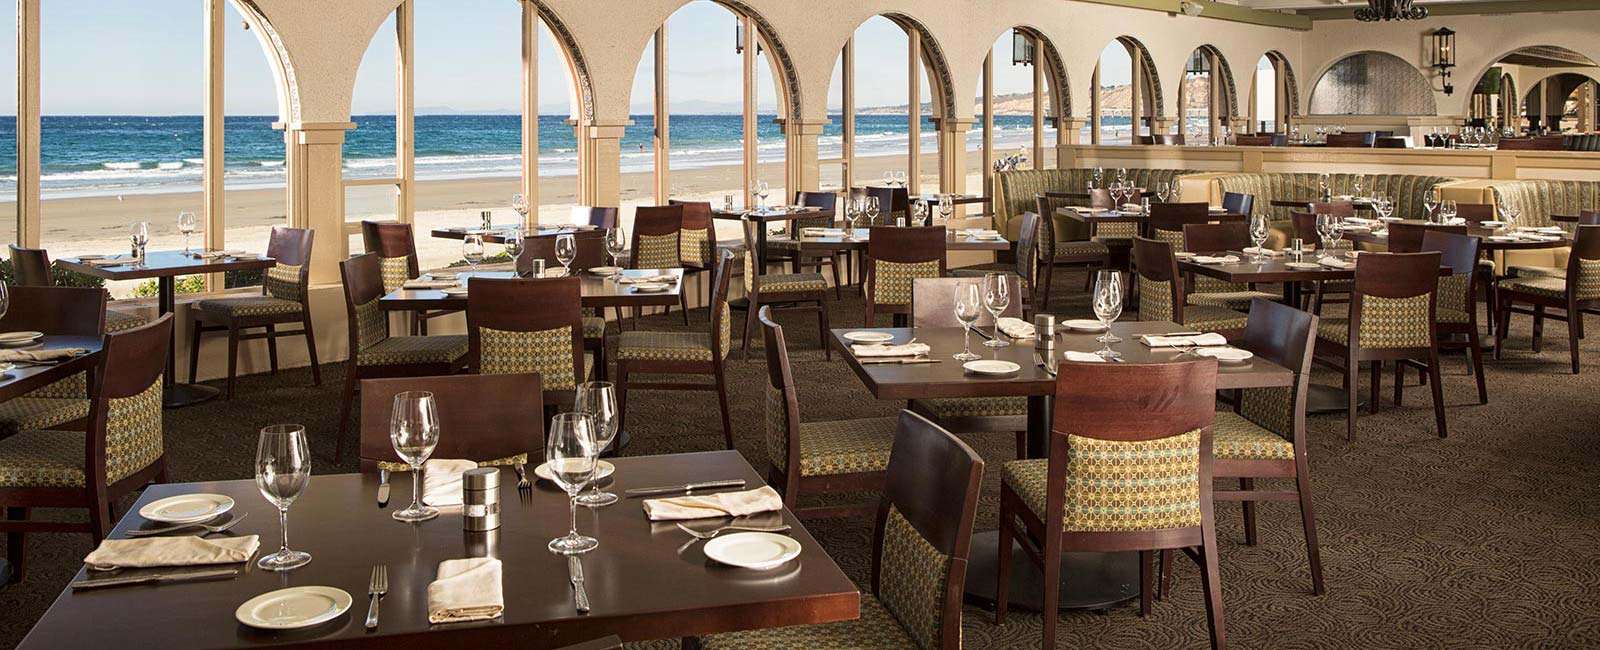 Career in The Shores Restaurant, California